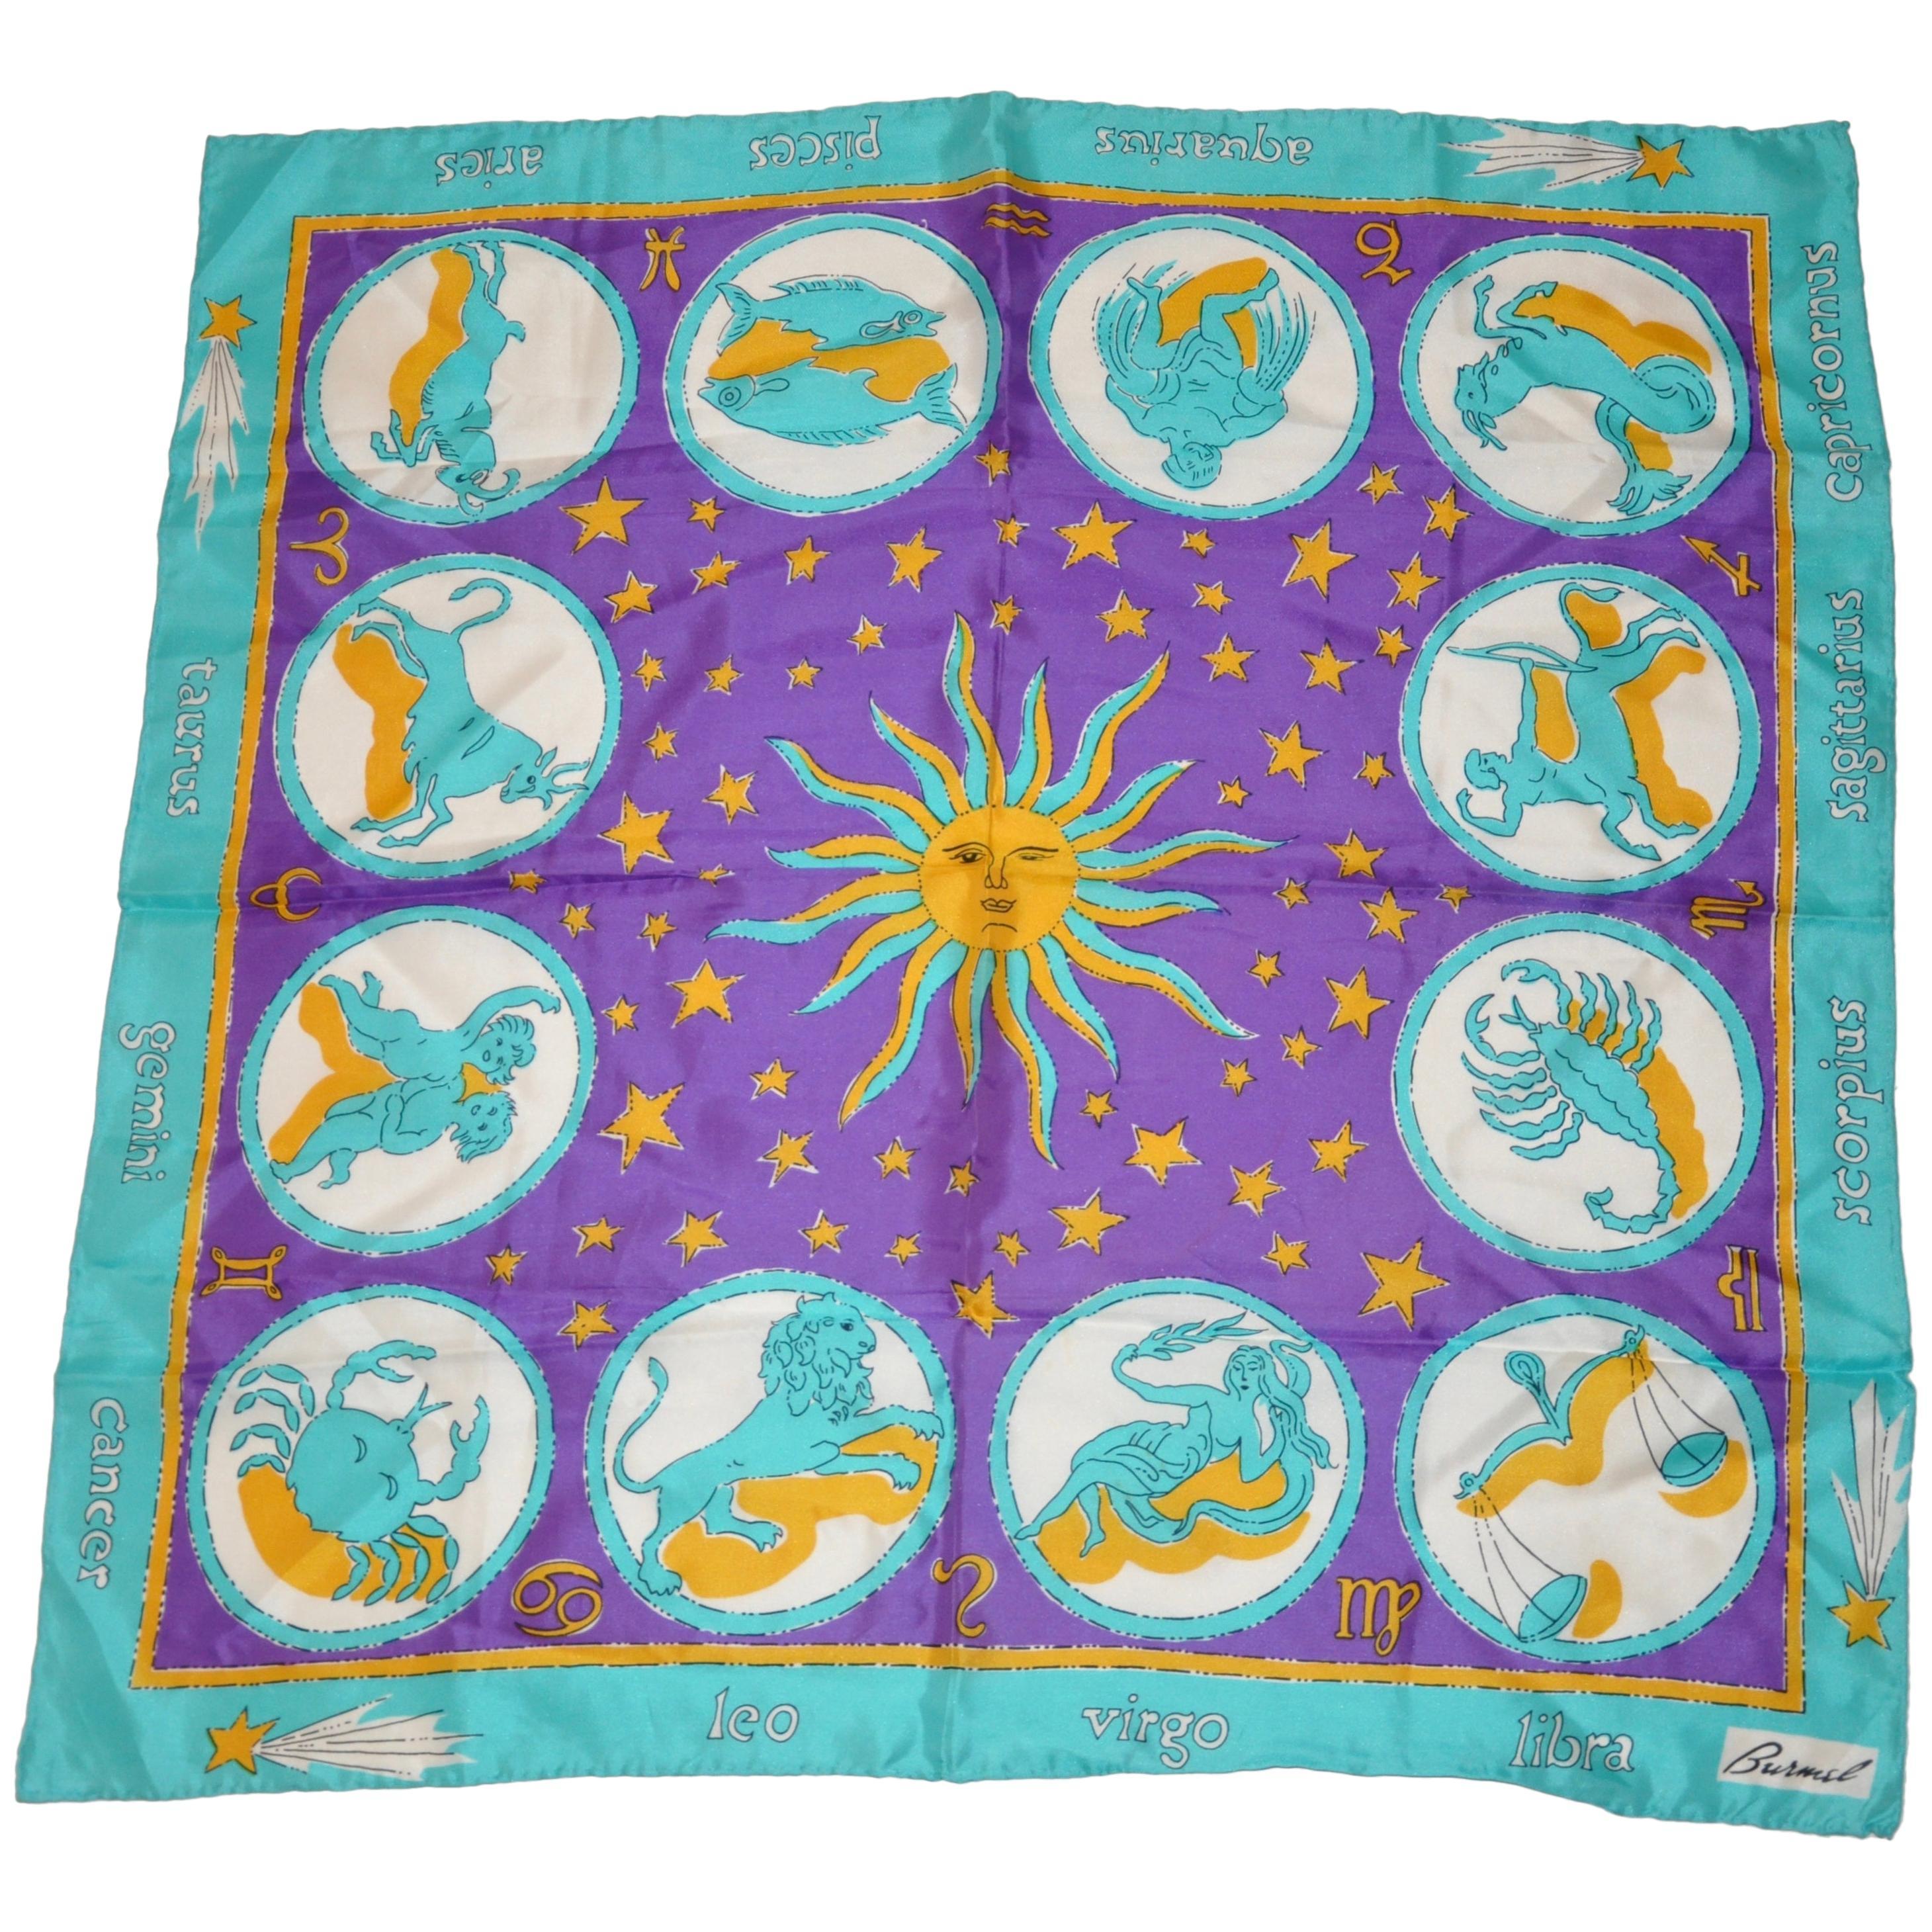 "Burmel Whimsical ""Astrological Signs"" Silk Jacquard Scarf"